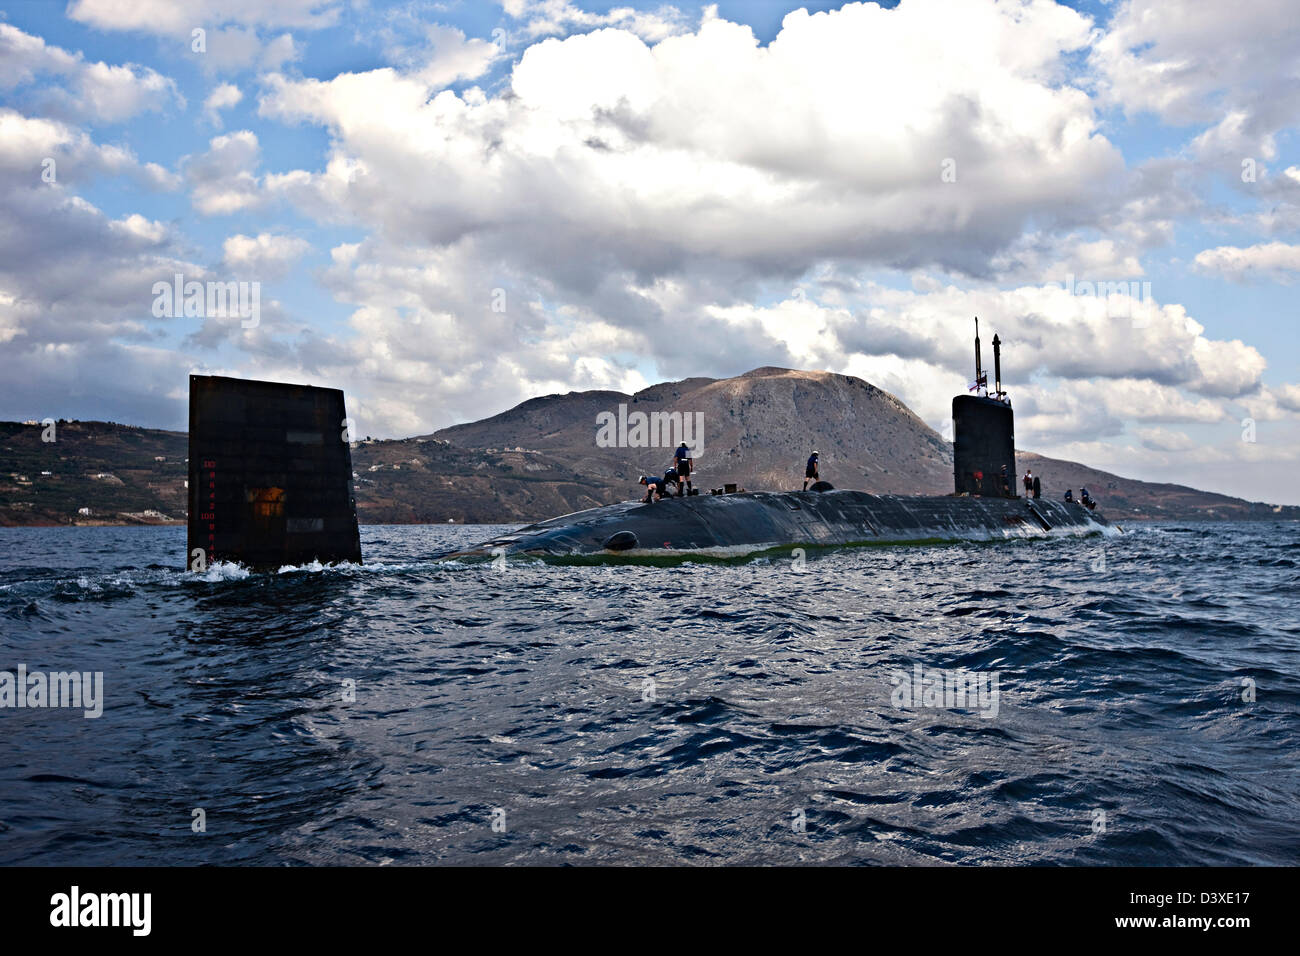 Nuclear Submarine HMS Talent on Egyptian coastline - Stock Image